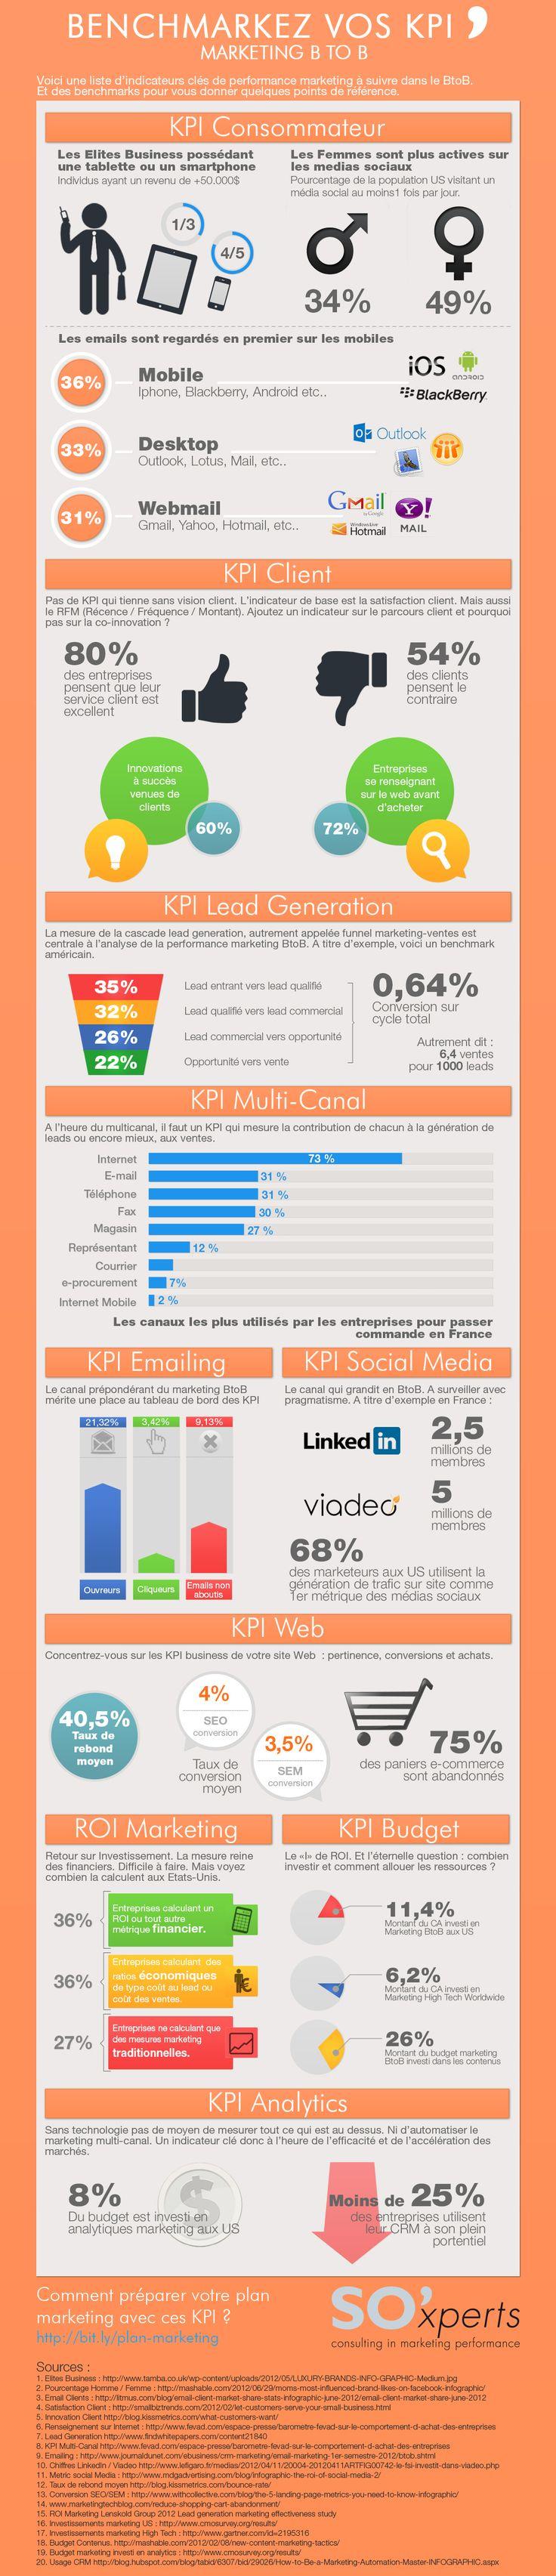 KPI Marketing B to B